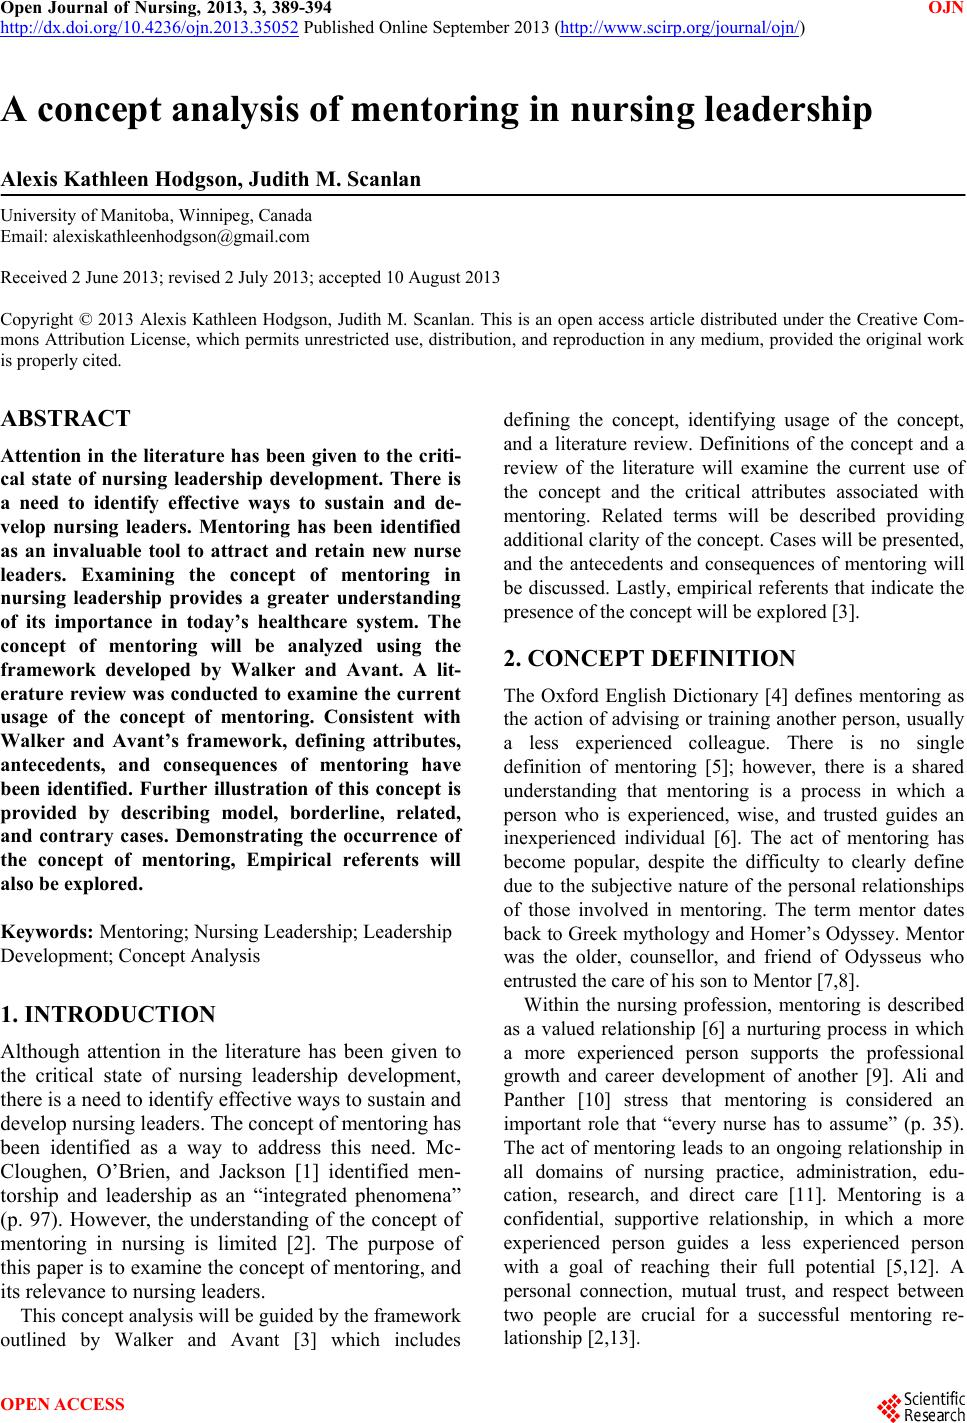 simulation review paper hcs 405